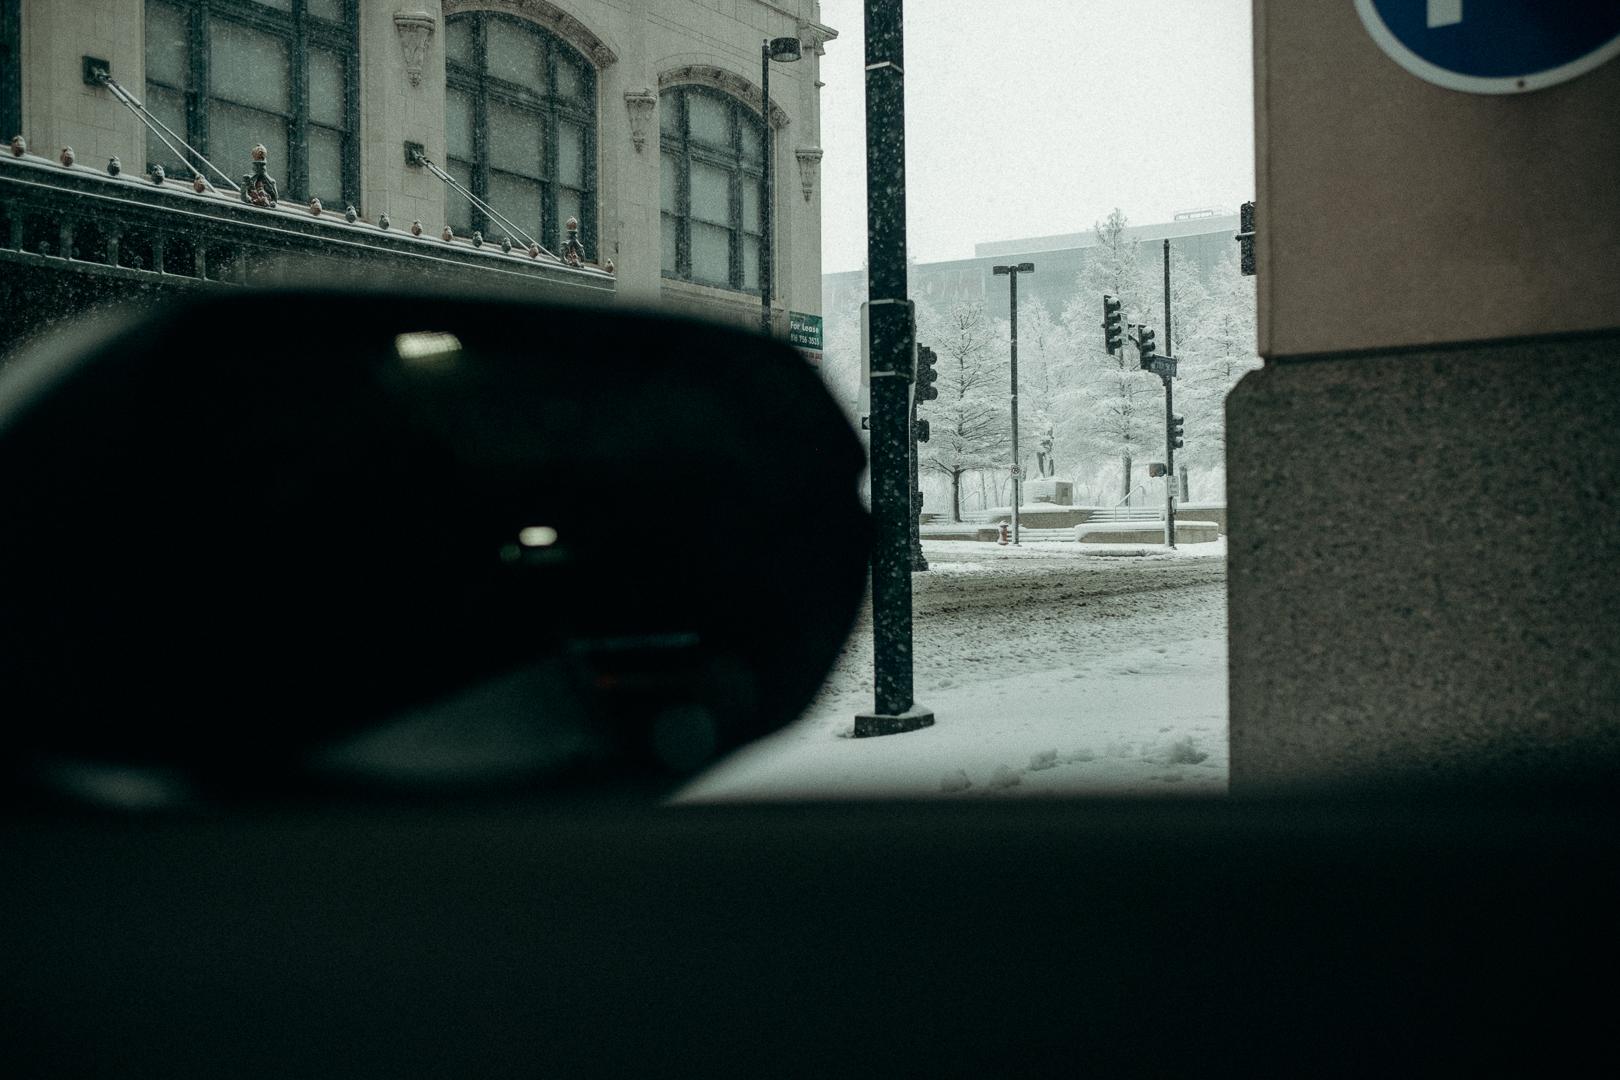 20190112_snowydaysin_kansascity_alihapperphoto_1.jpg